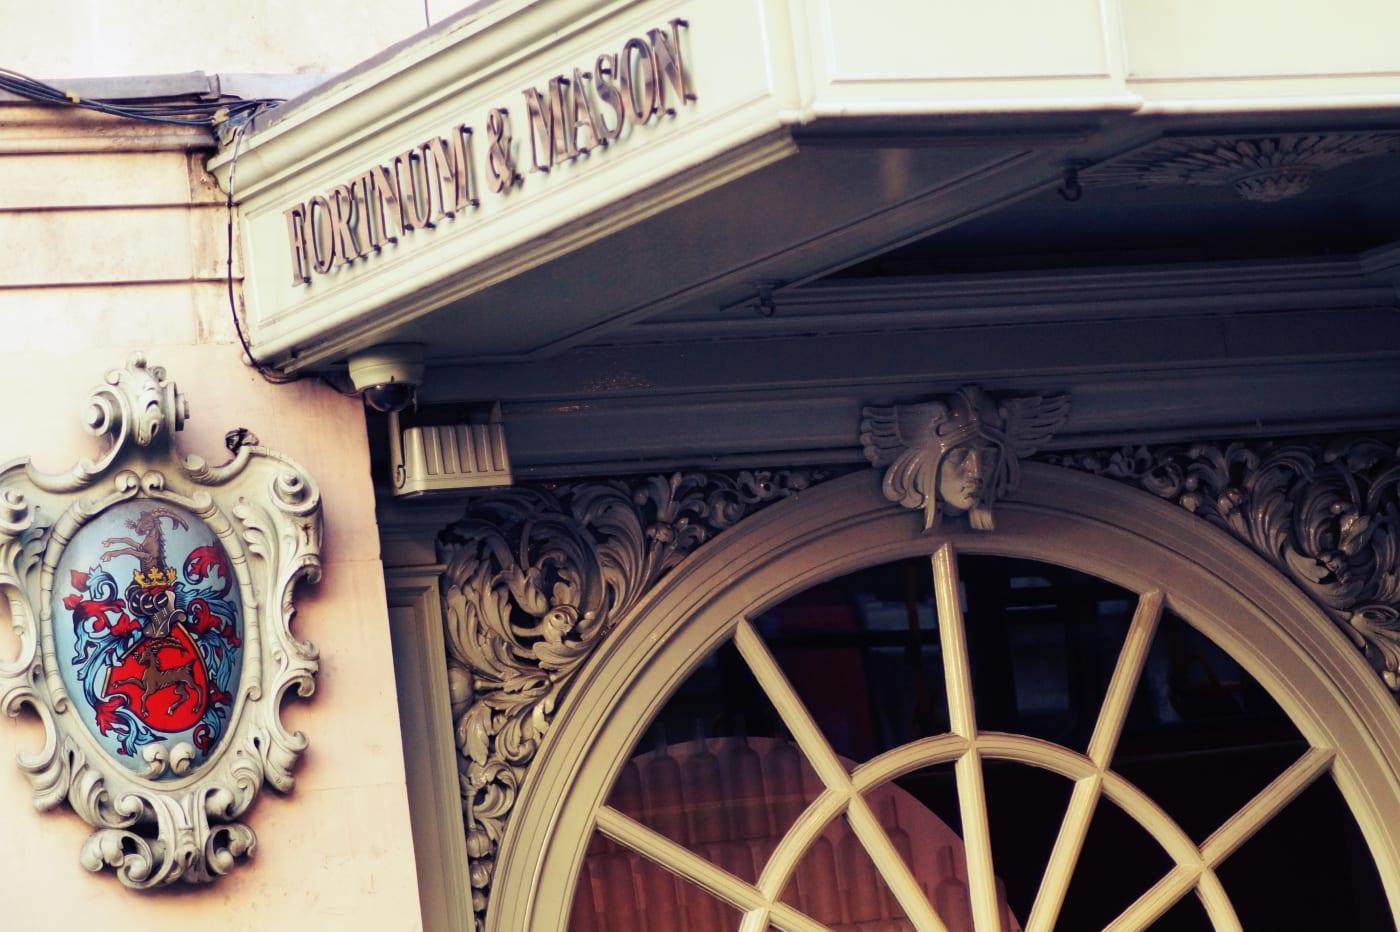 forntum-mason-london-front